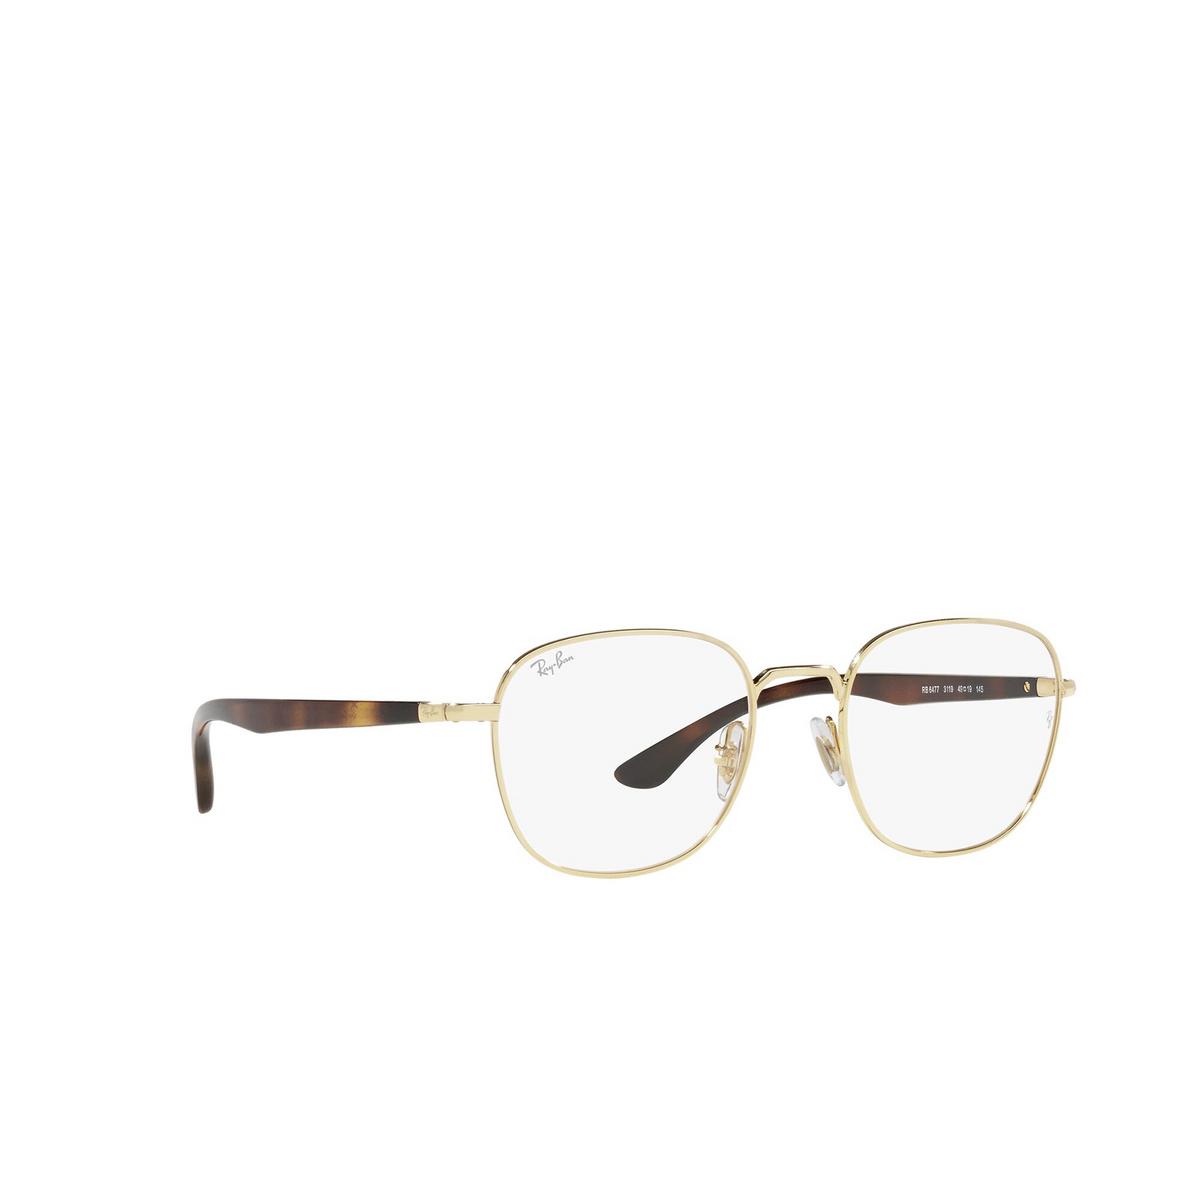 Ray-Ban® Square Eyeglasses: RX6477 color Arista 3119 - three-quarters view.